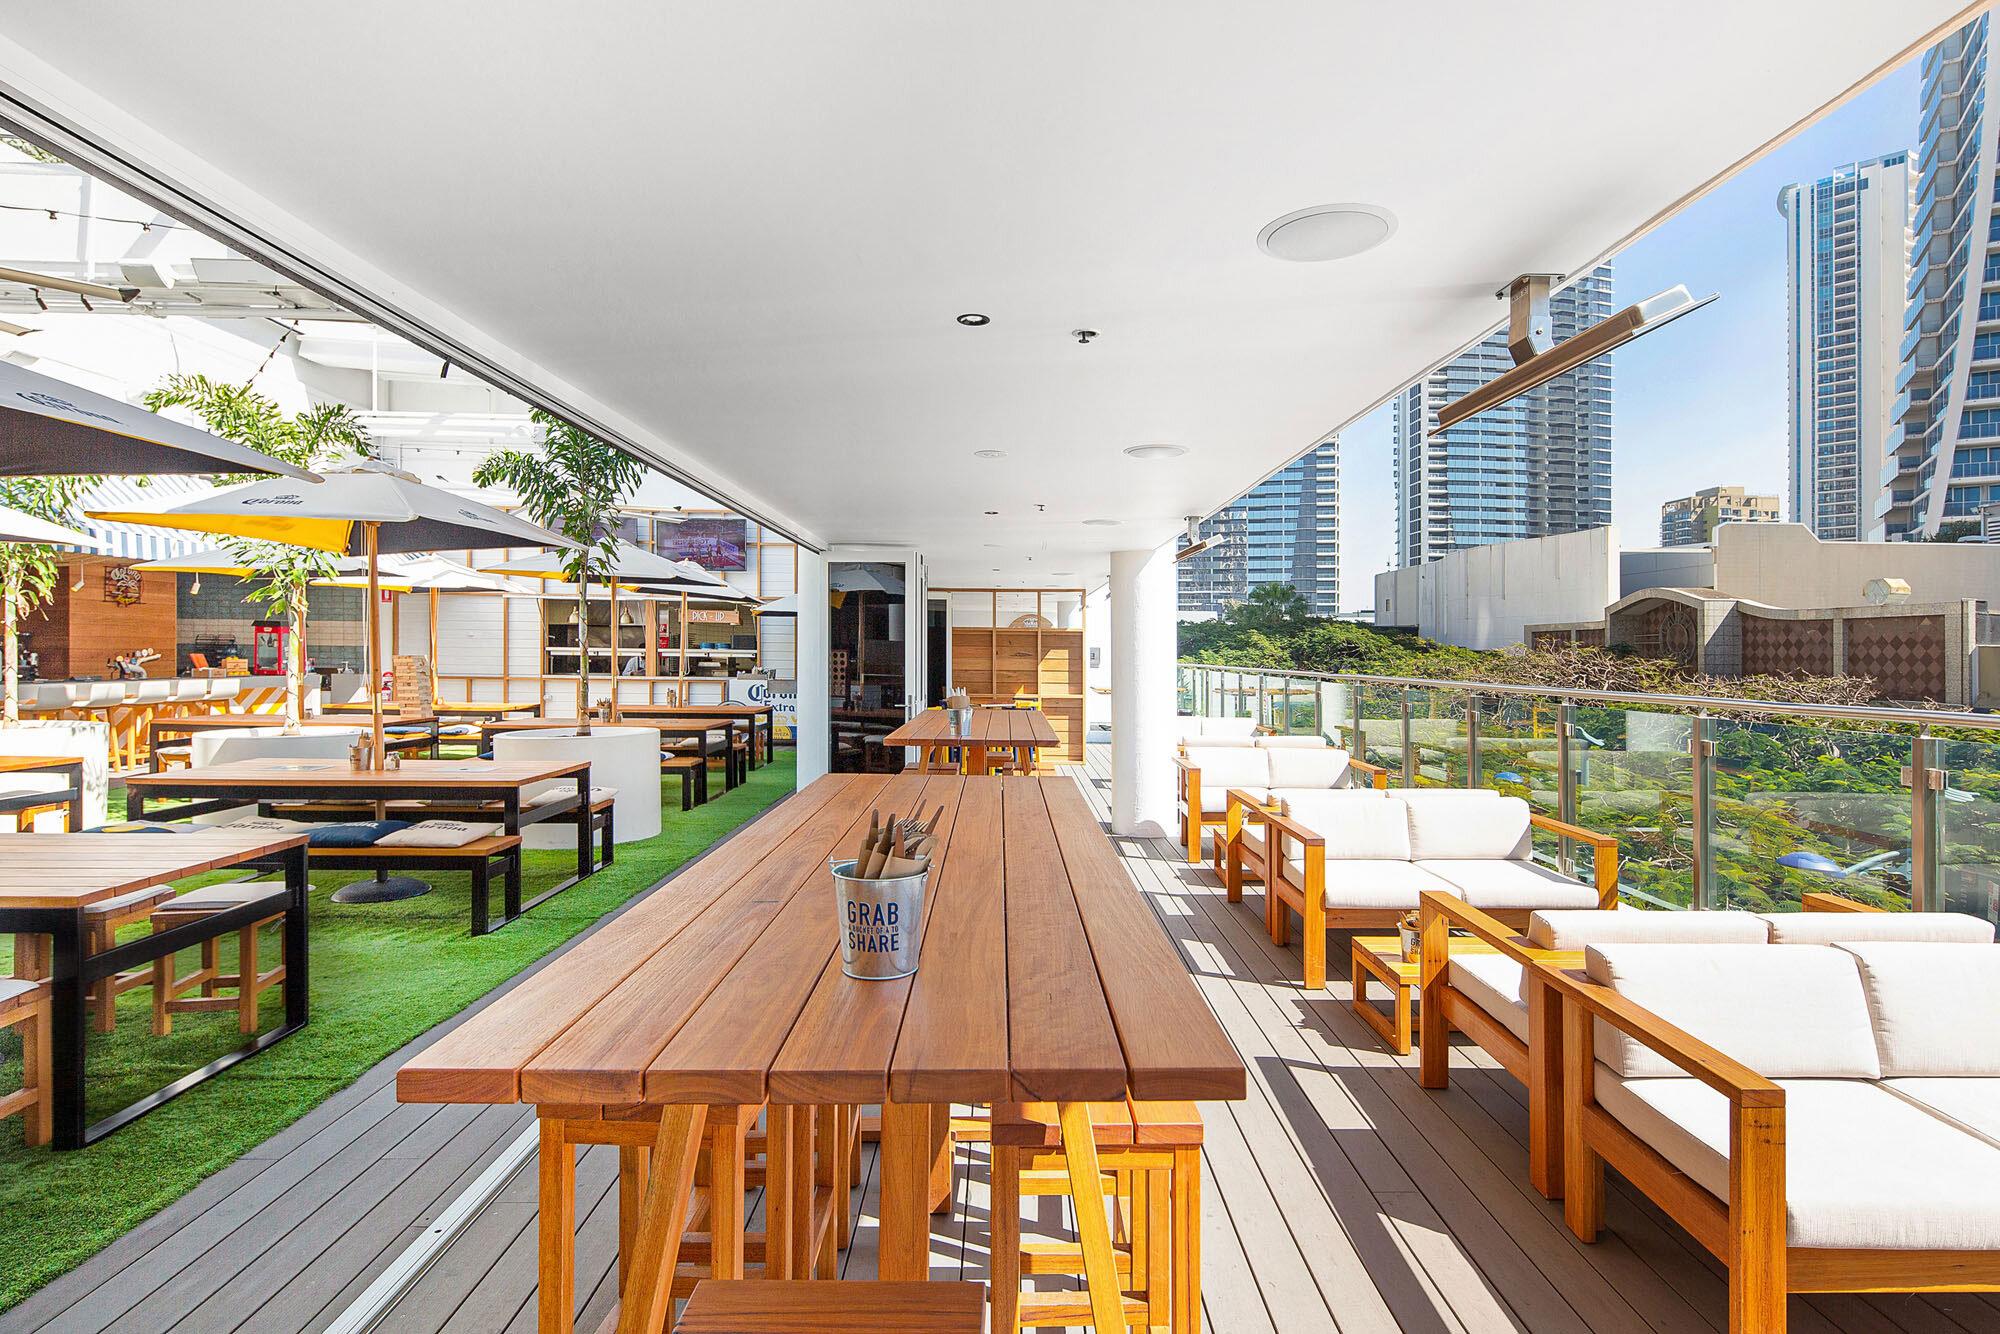 Surfers-Paradise-Beer-Garden-Pub-Architecture-3.jpg